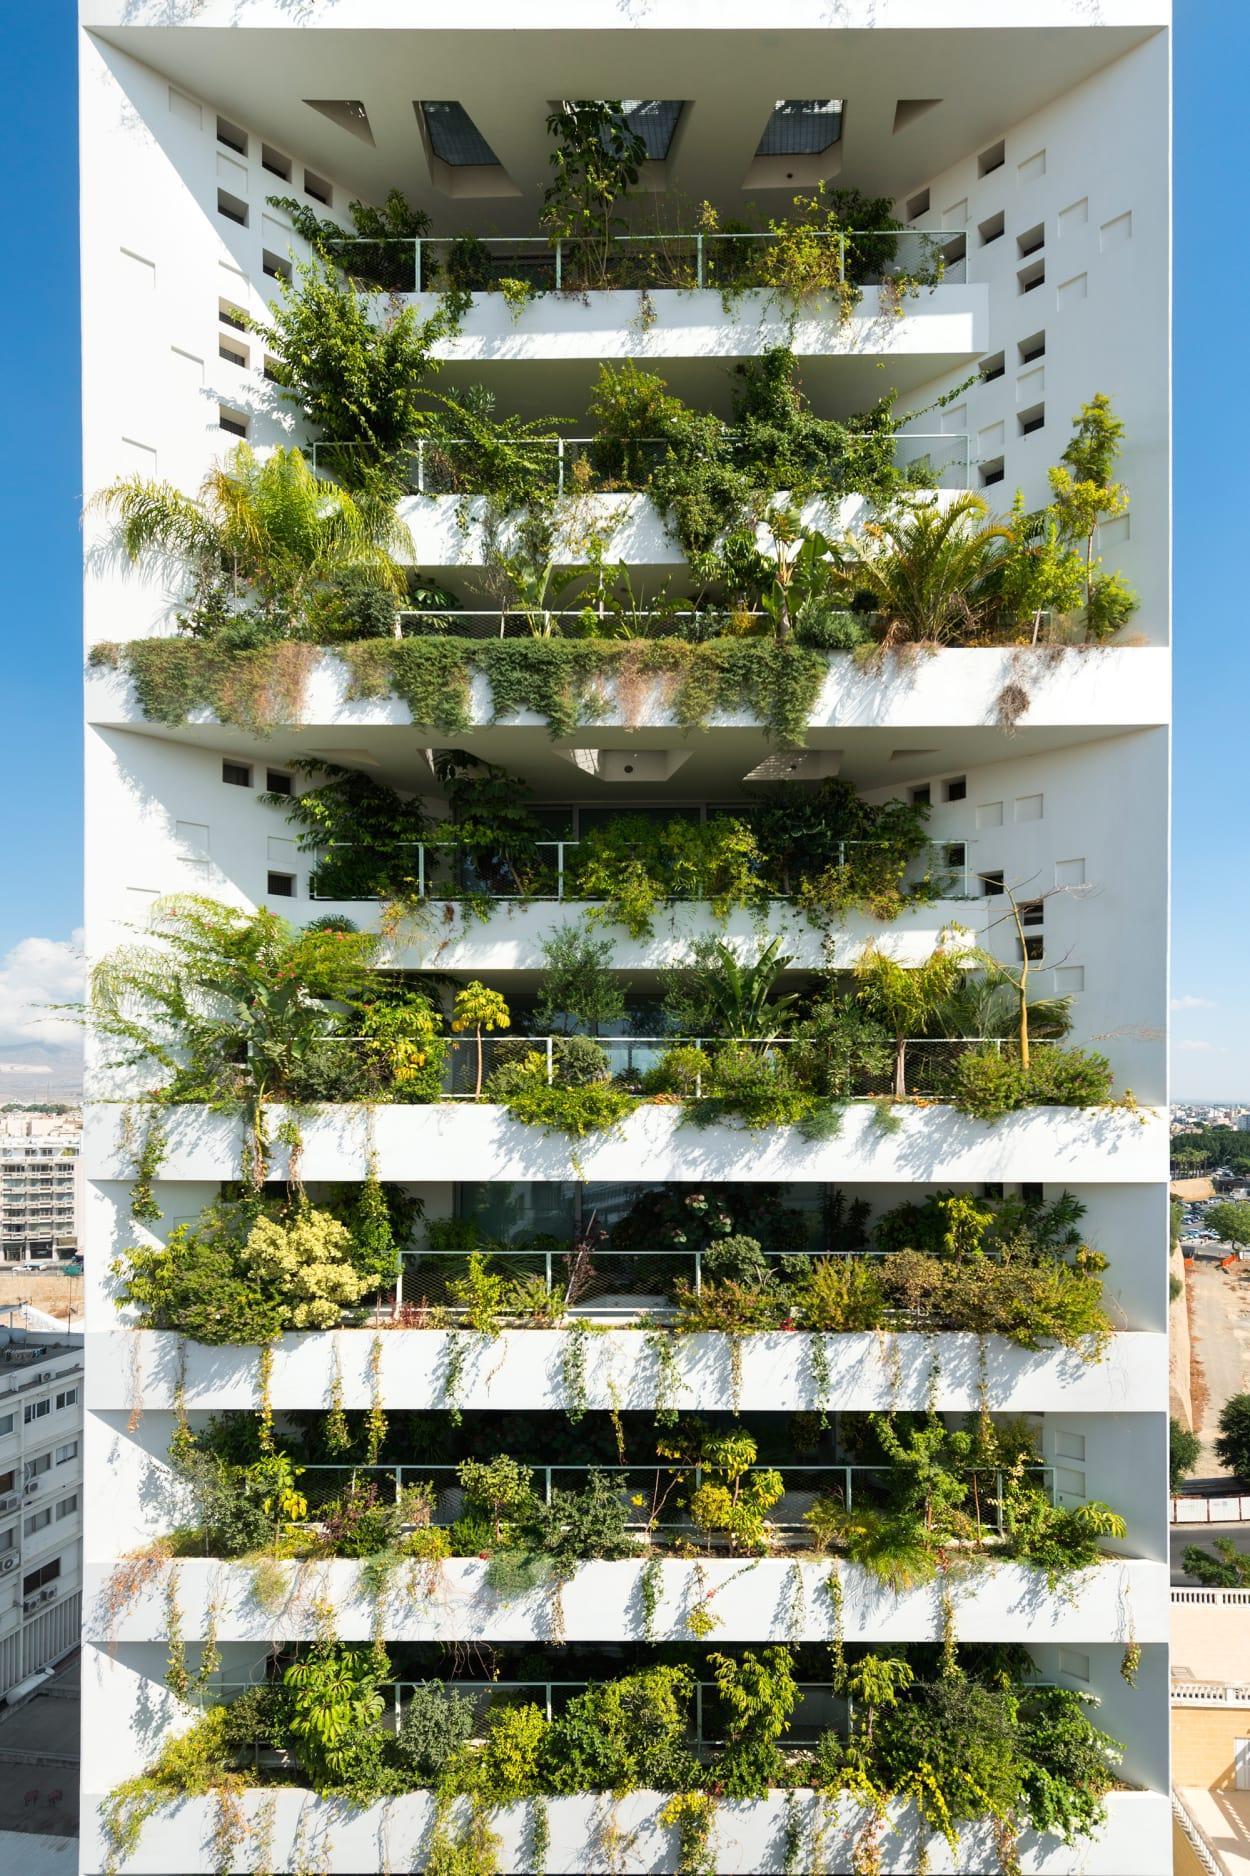 White Walls, Jean Nouvel, Zypern Architektur